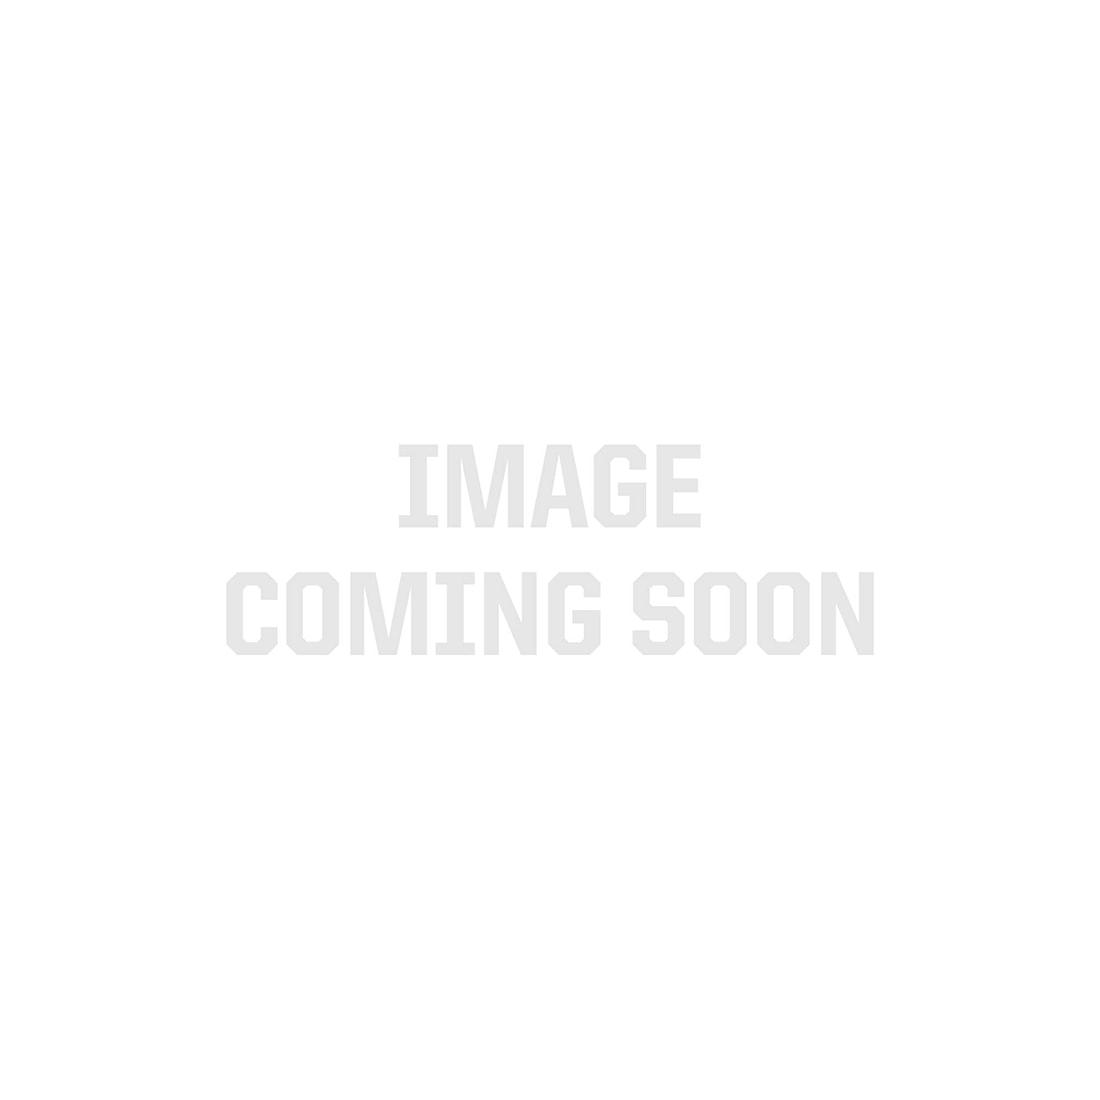 TruColor 2835 LED Strip Light - 5,000K - 160/m - CurrentControl - Sample Kit